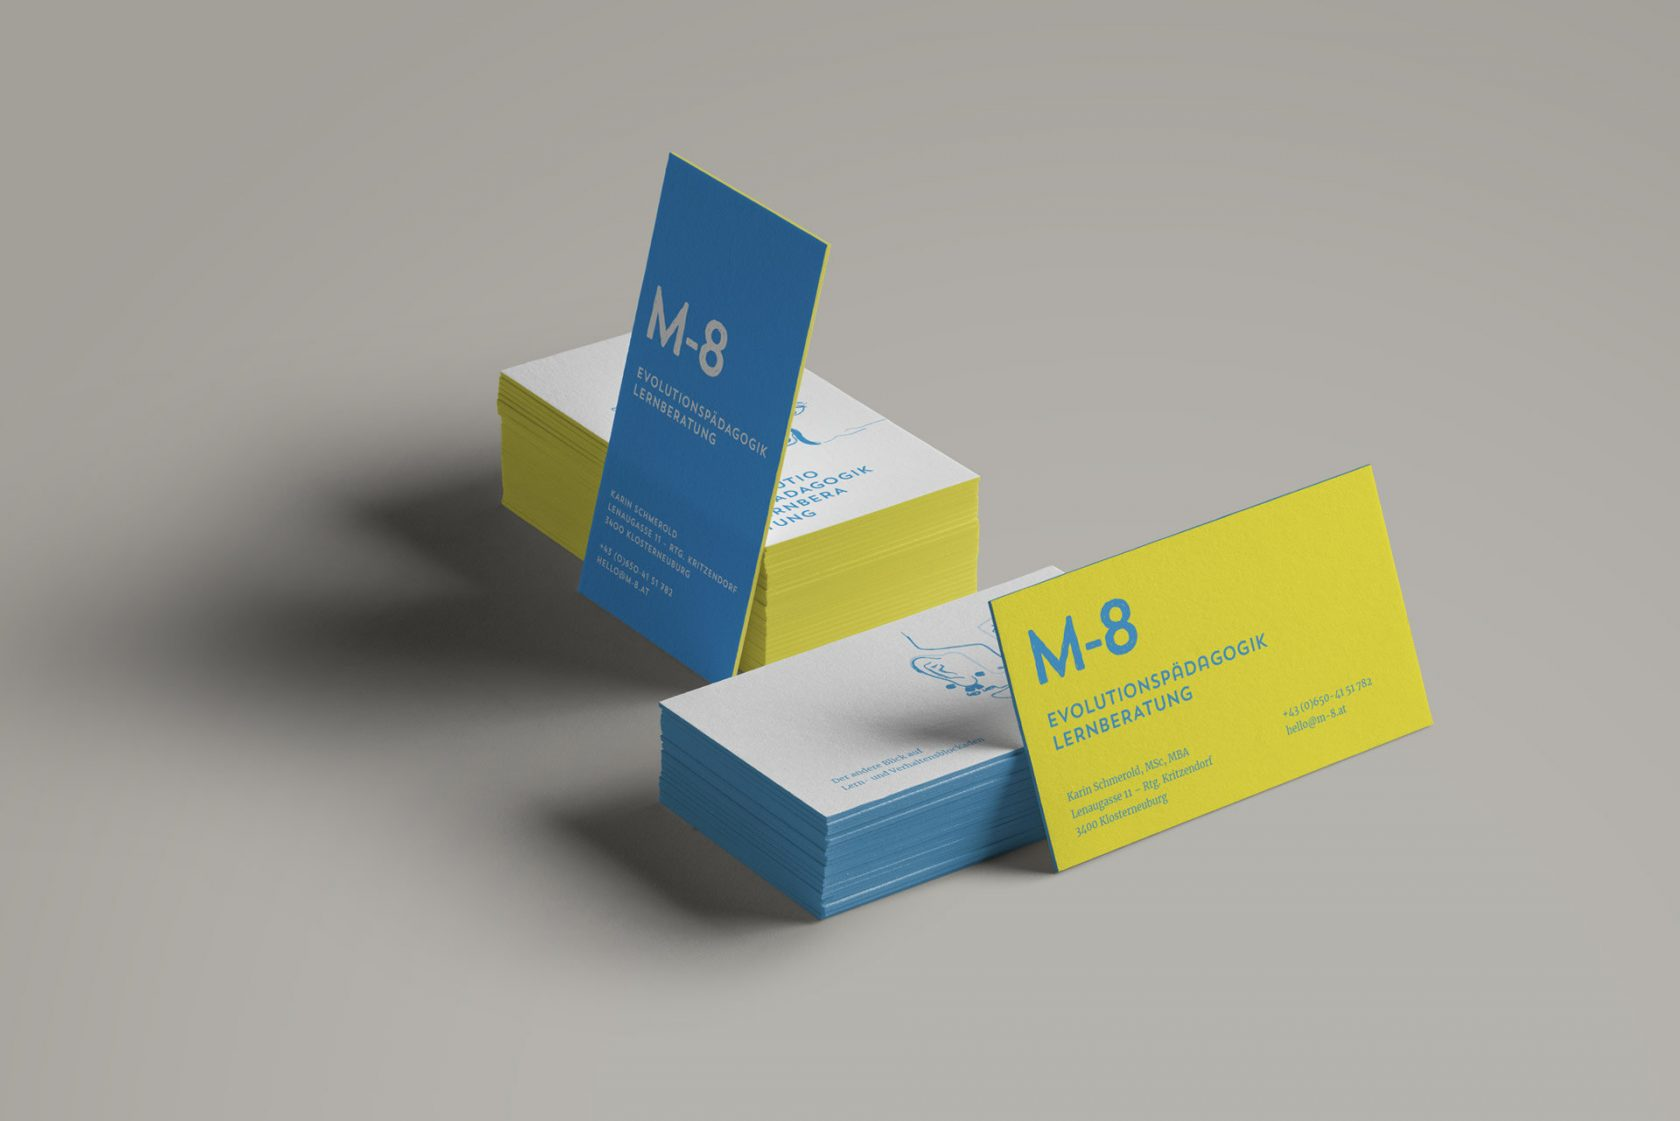 projekte_m-8-evolutionspaedagogik06-website